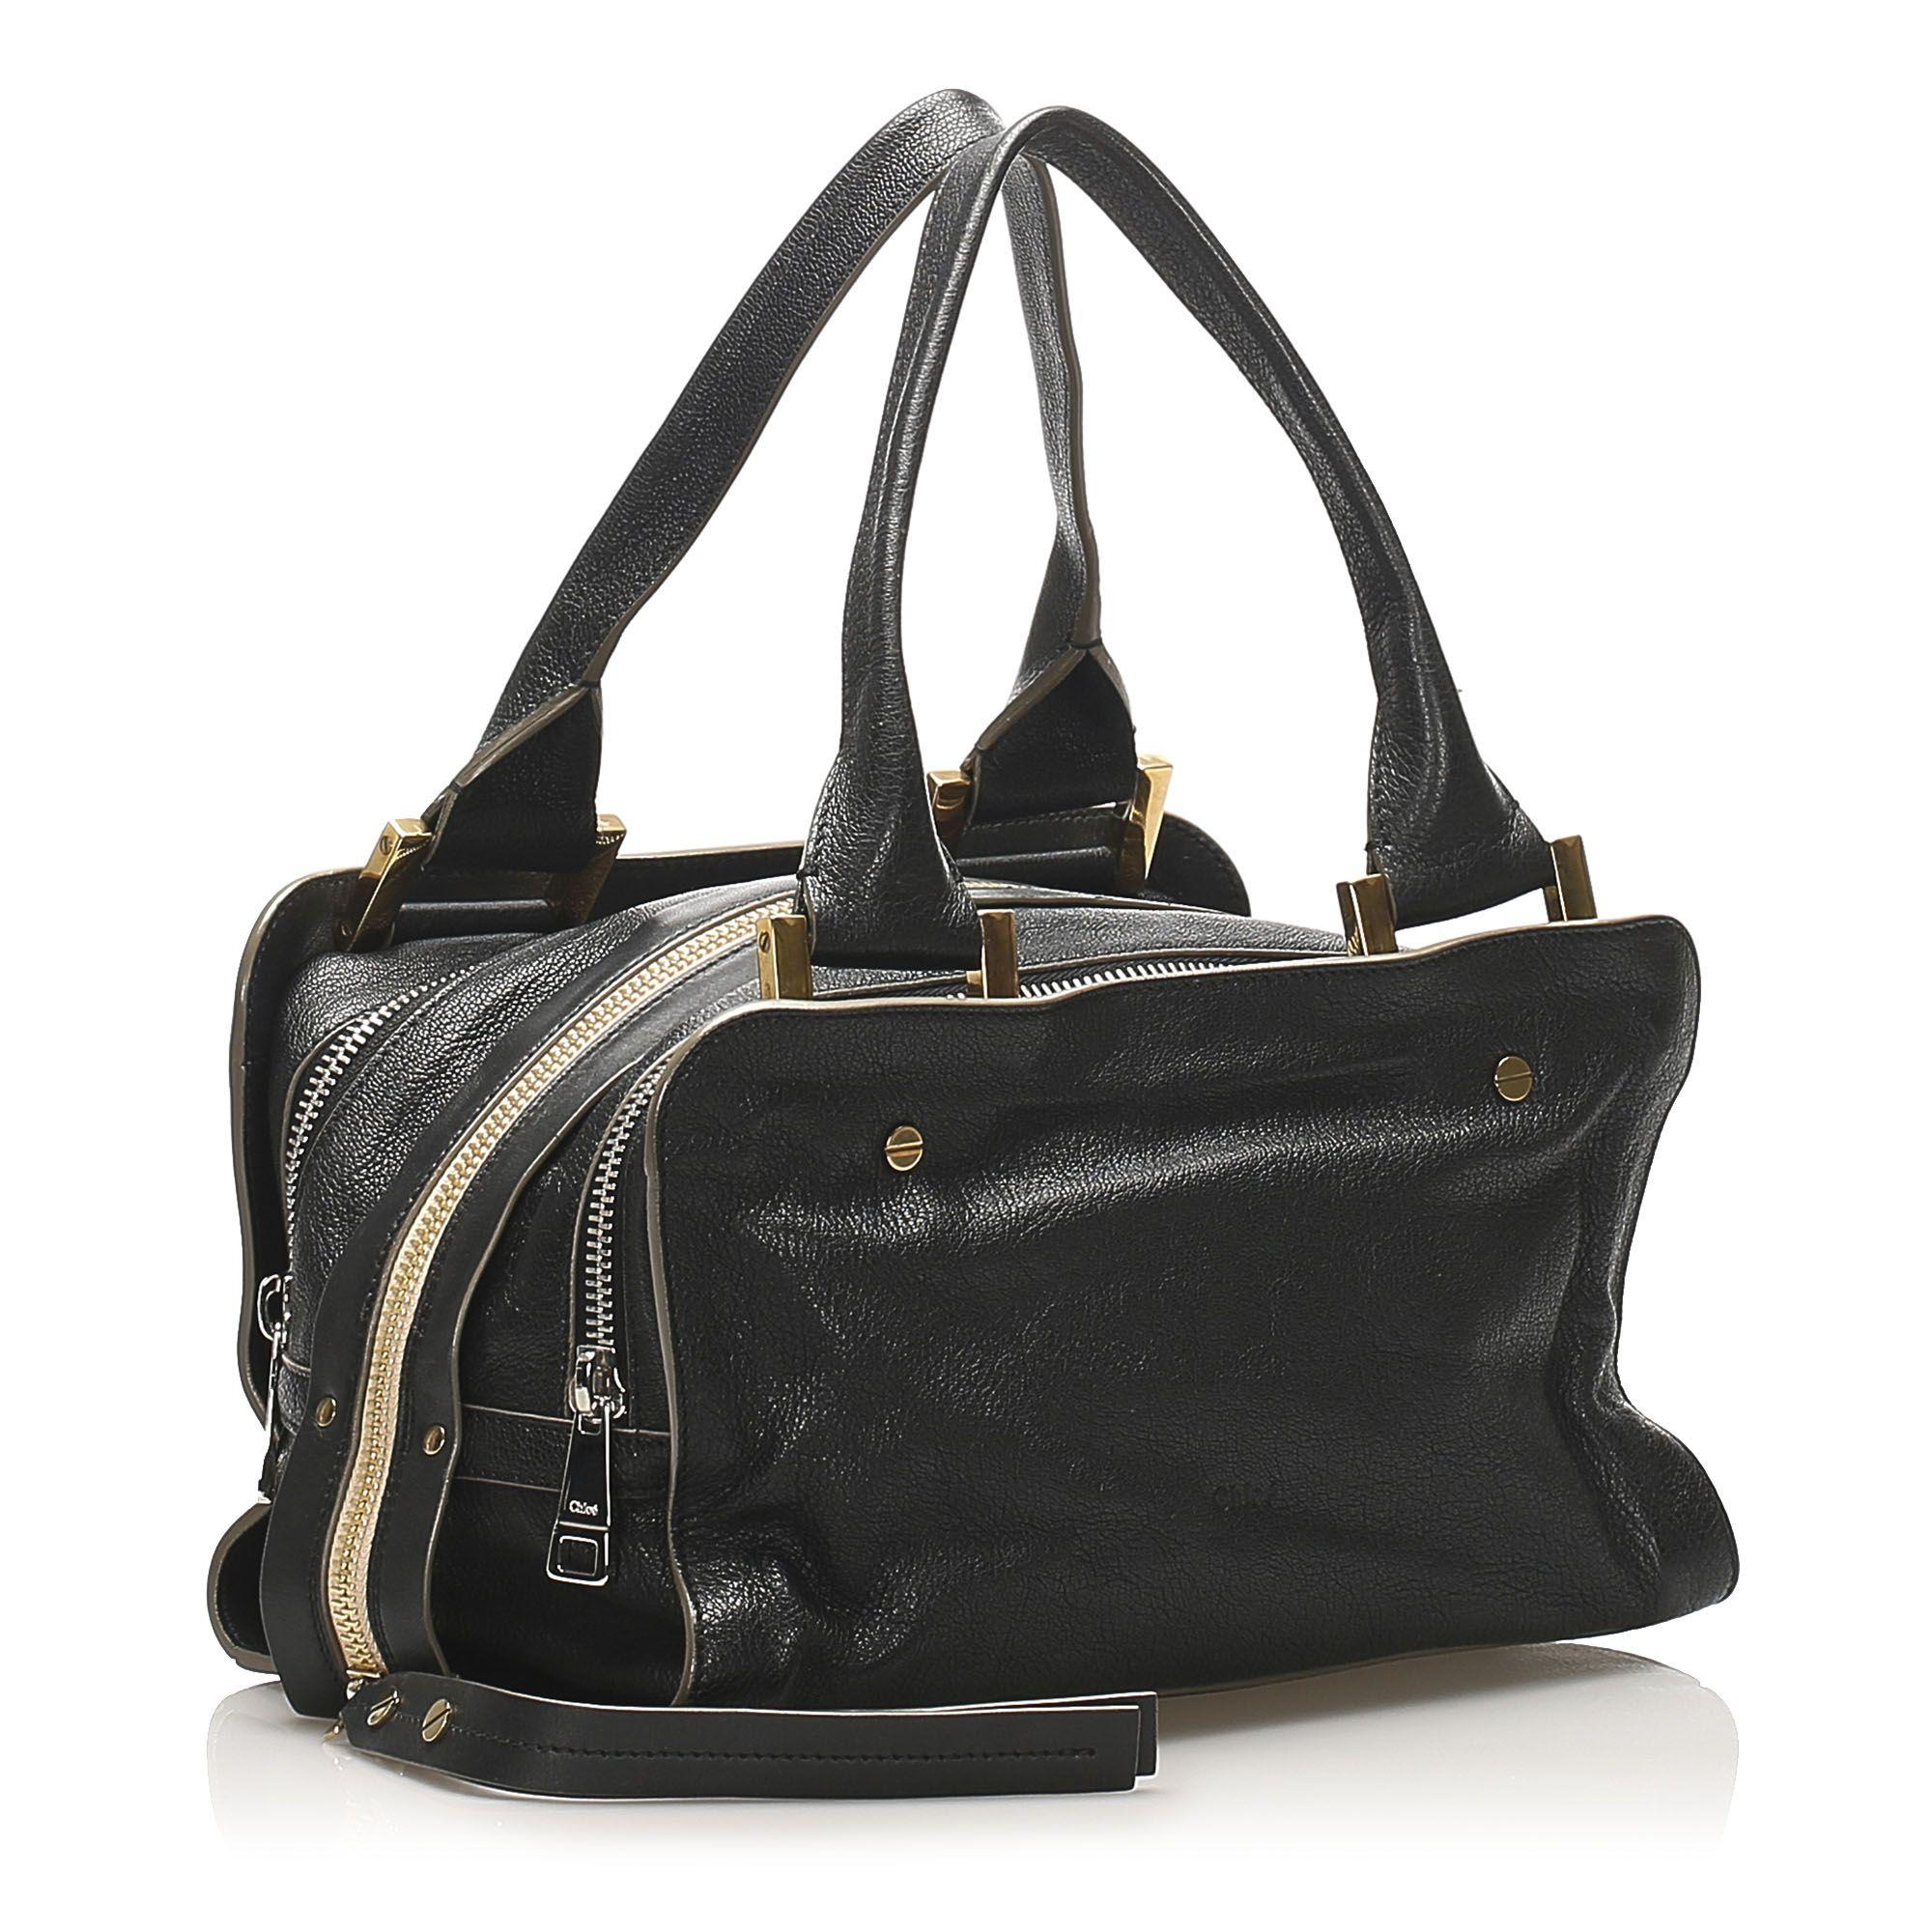 Vintage Chloe Dalston Leather Handbag Black